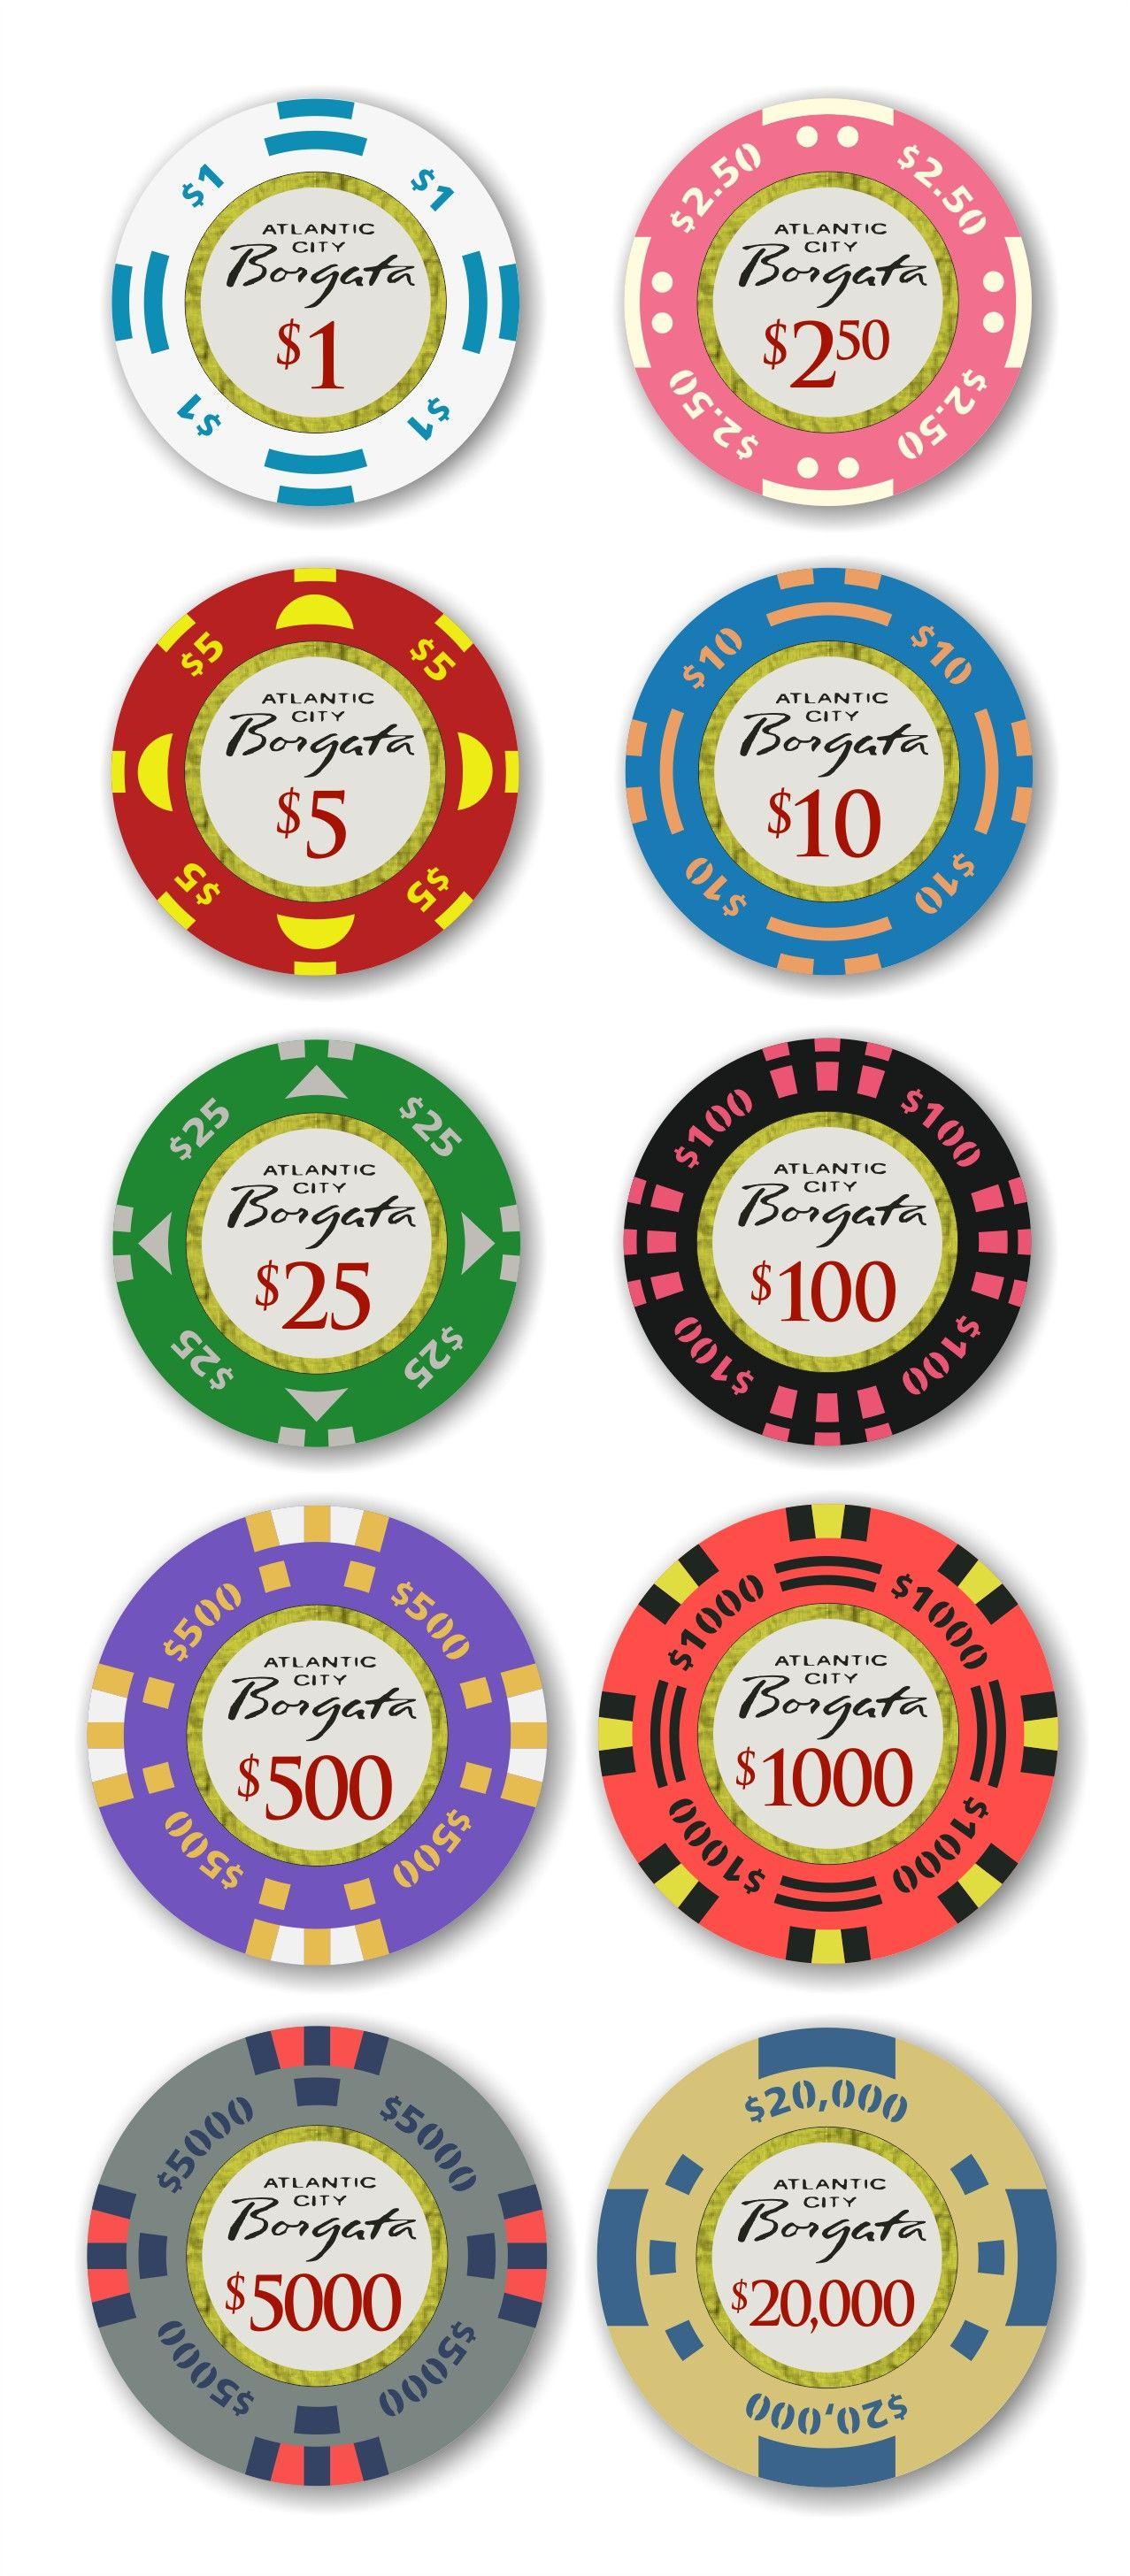 Borgata Casino Atlantic City Chips Poker Chips Poker Casino